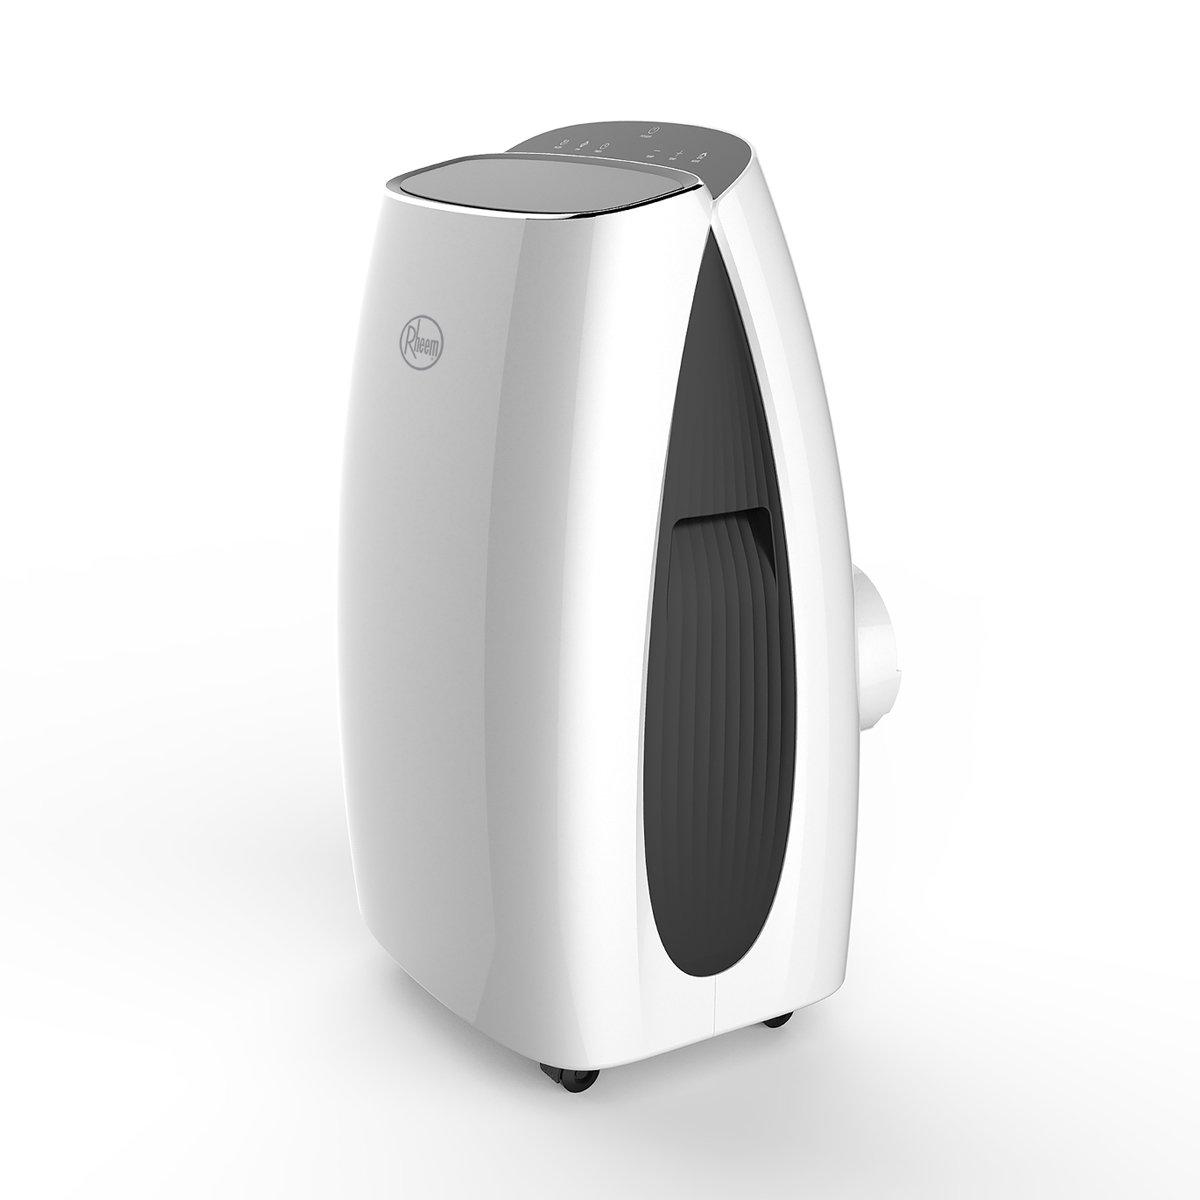 Sears aire acondicionado portatil for Consumo aire acondicionado portatil